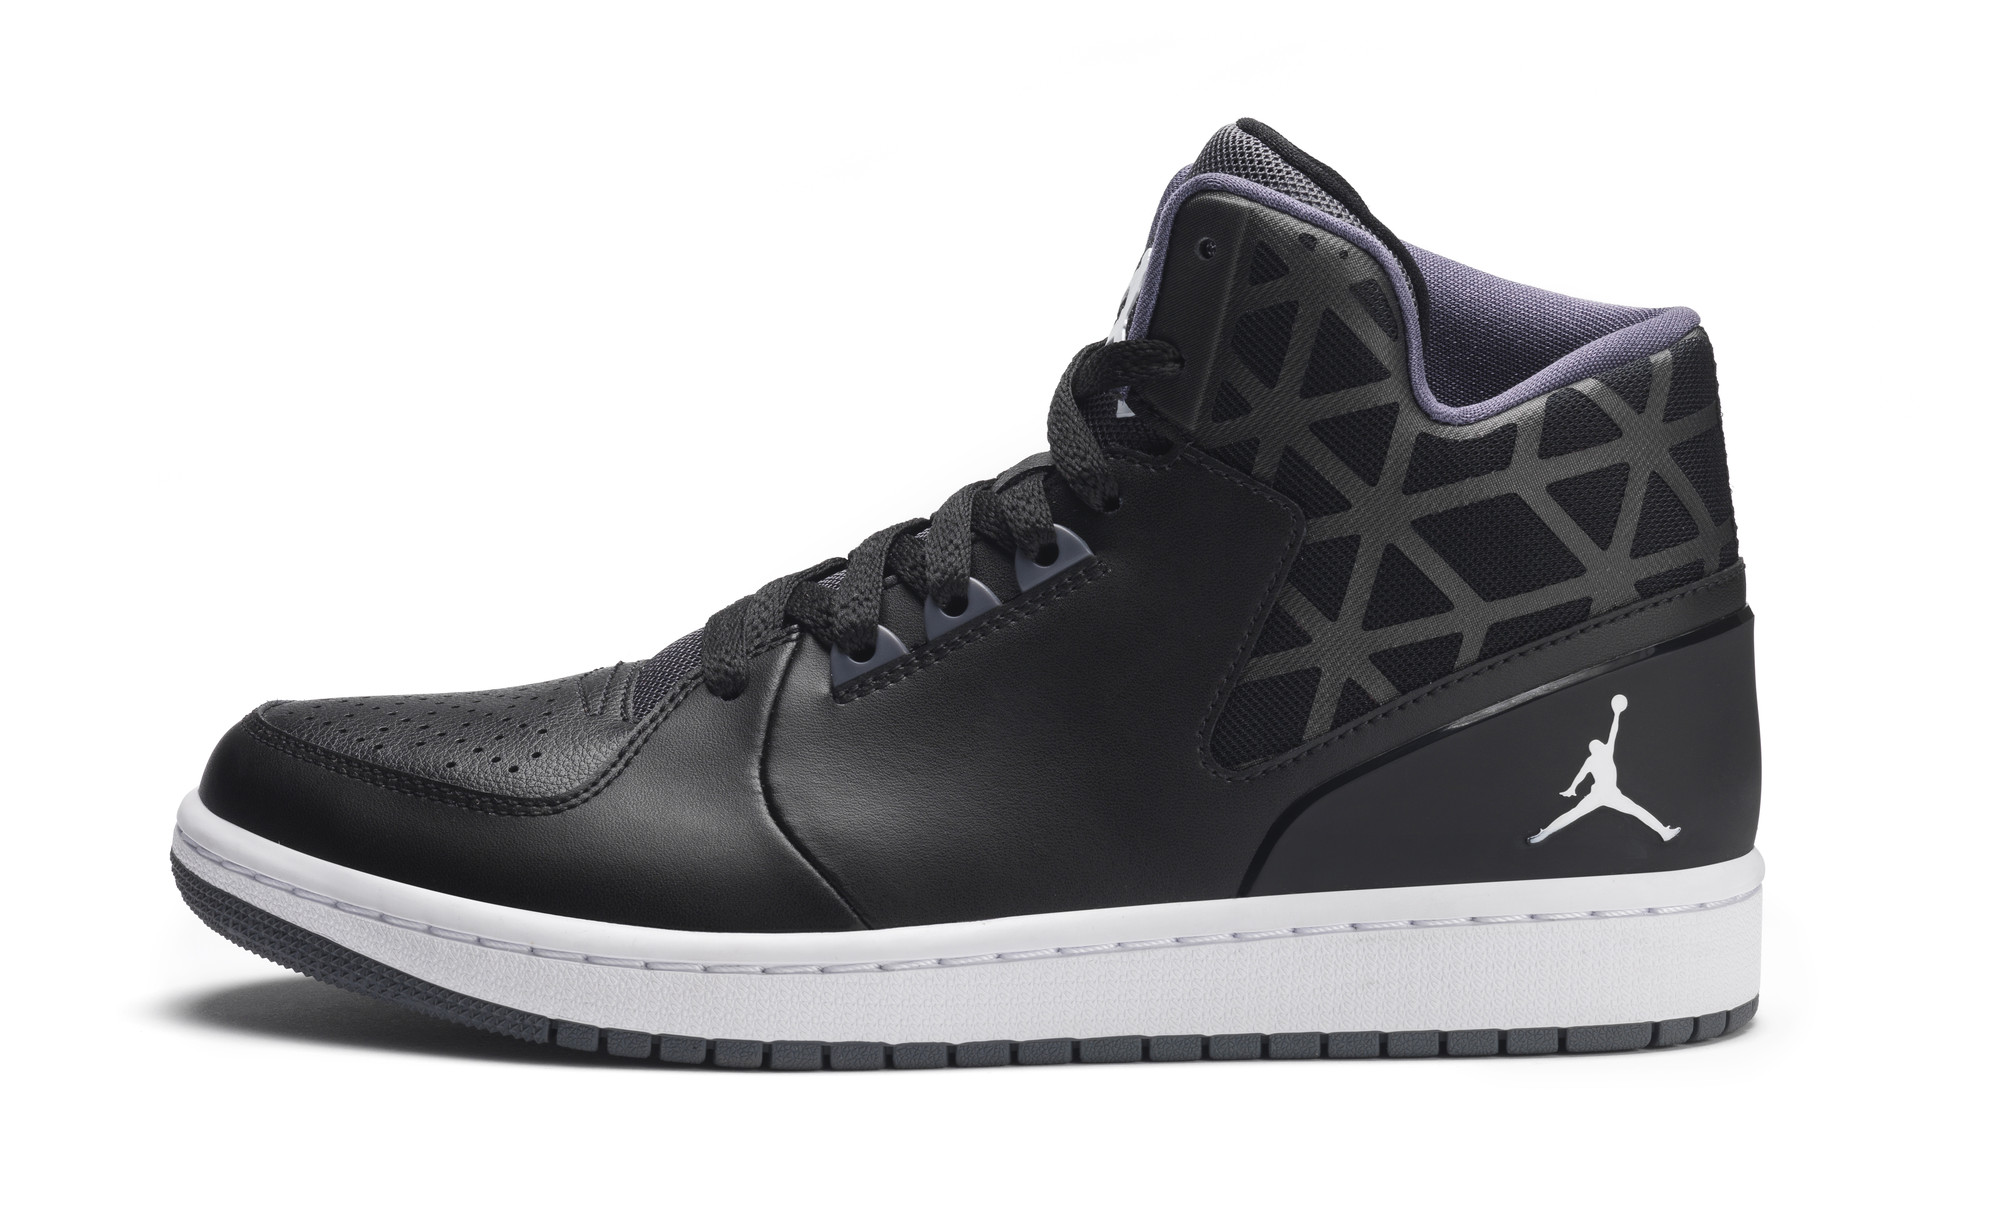 RS93012_Foot Locker Exclusive_Nike Jordan 1 Flight 3-lpr